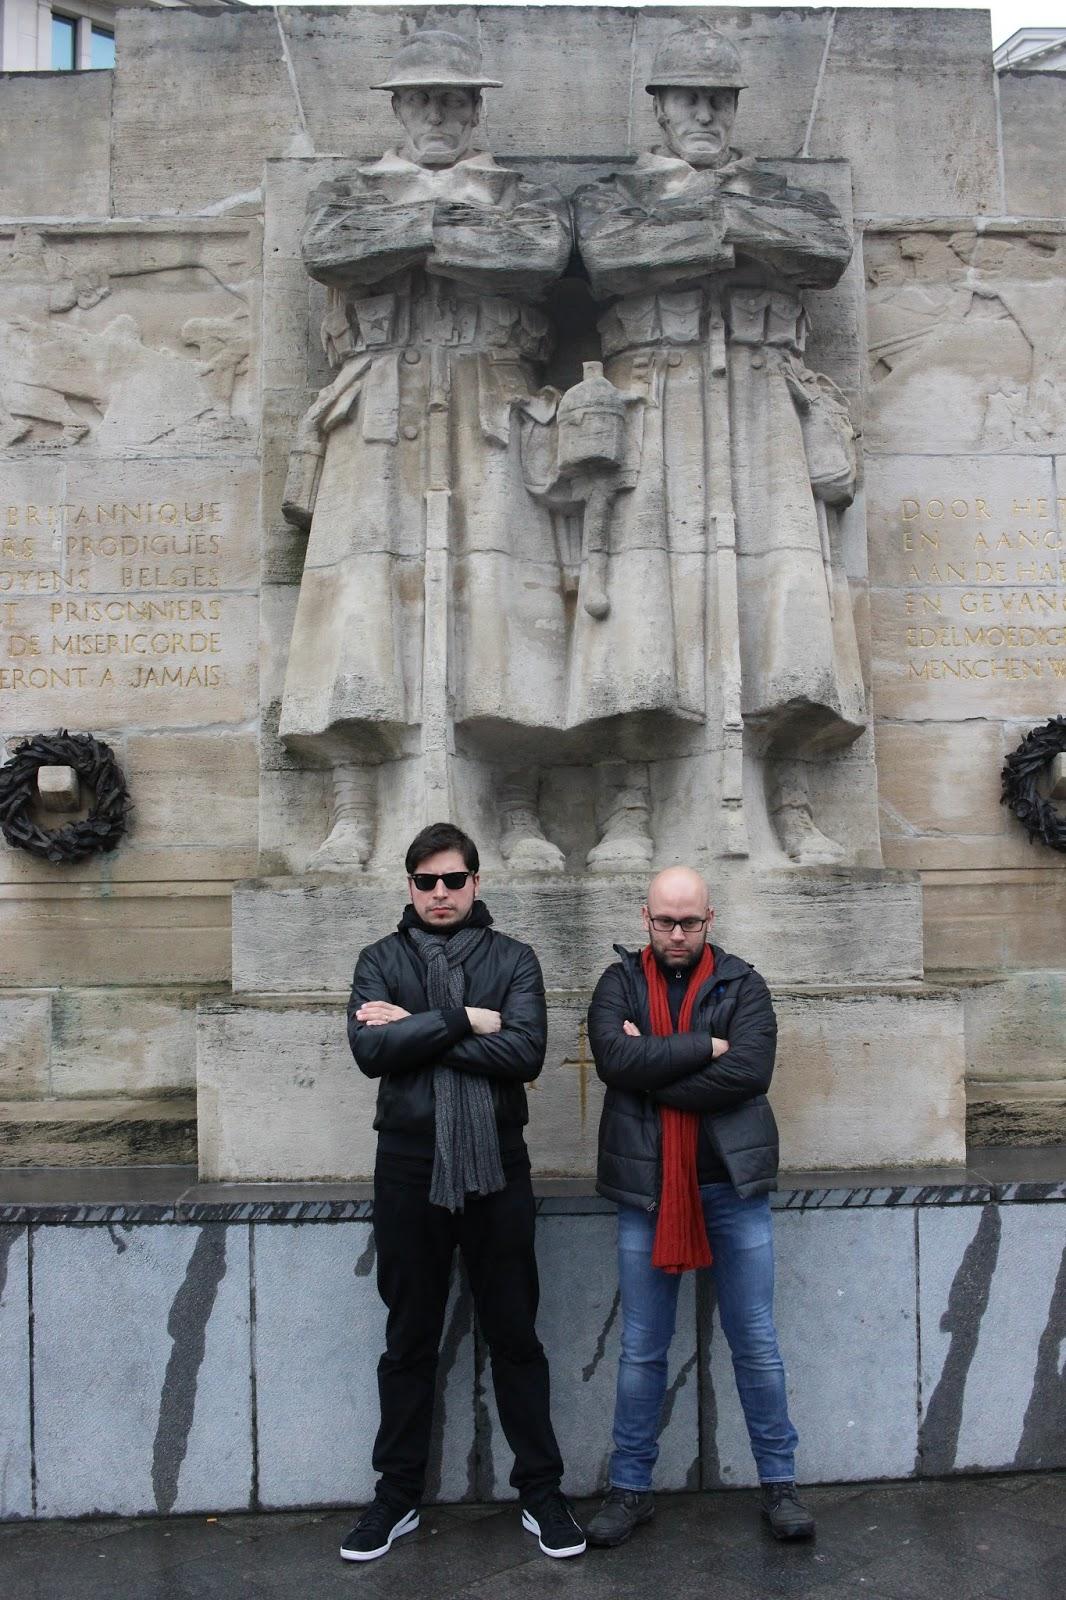 turismo belgica